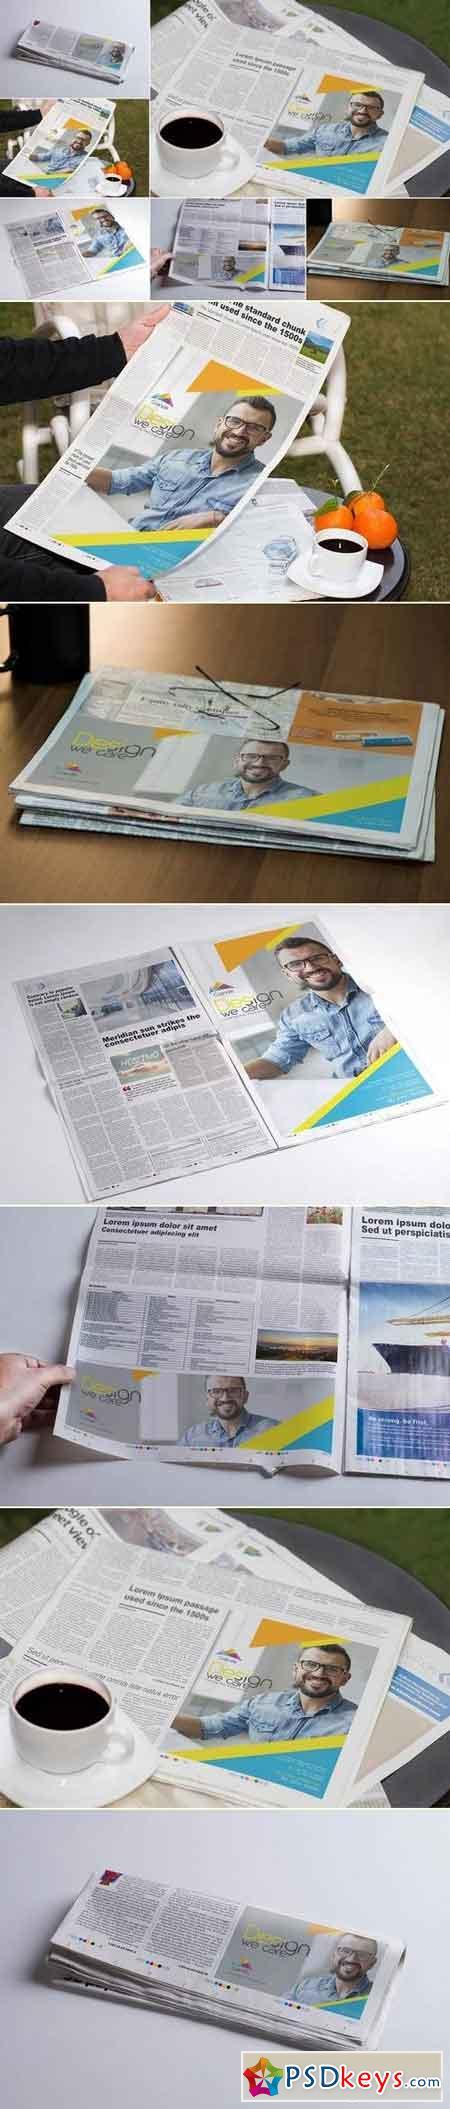 Newspaper Print Ad Design Mockups